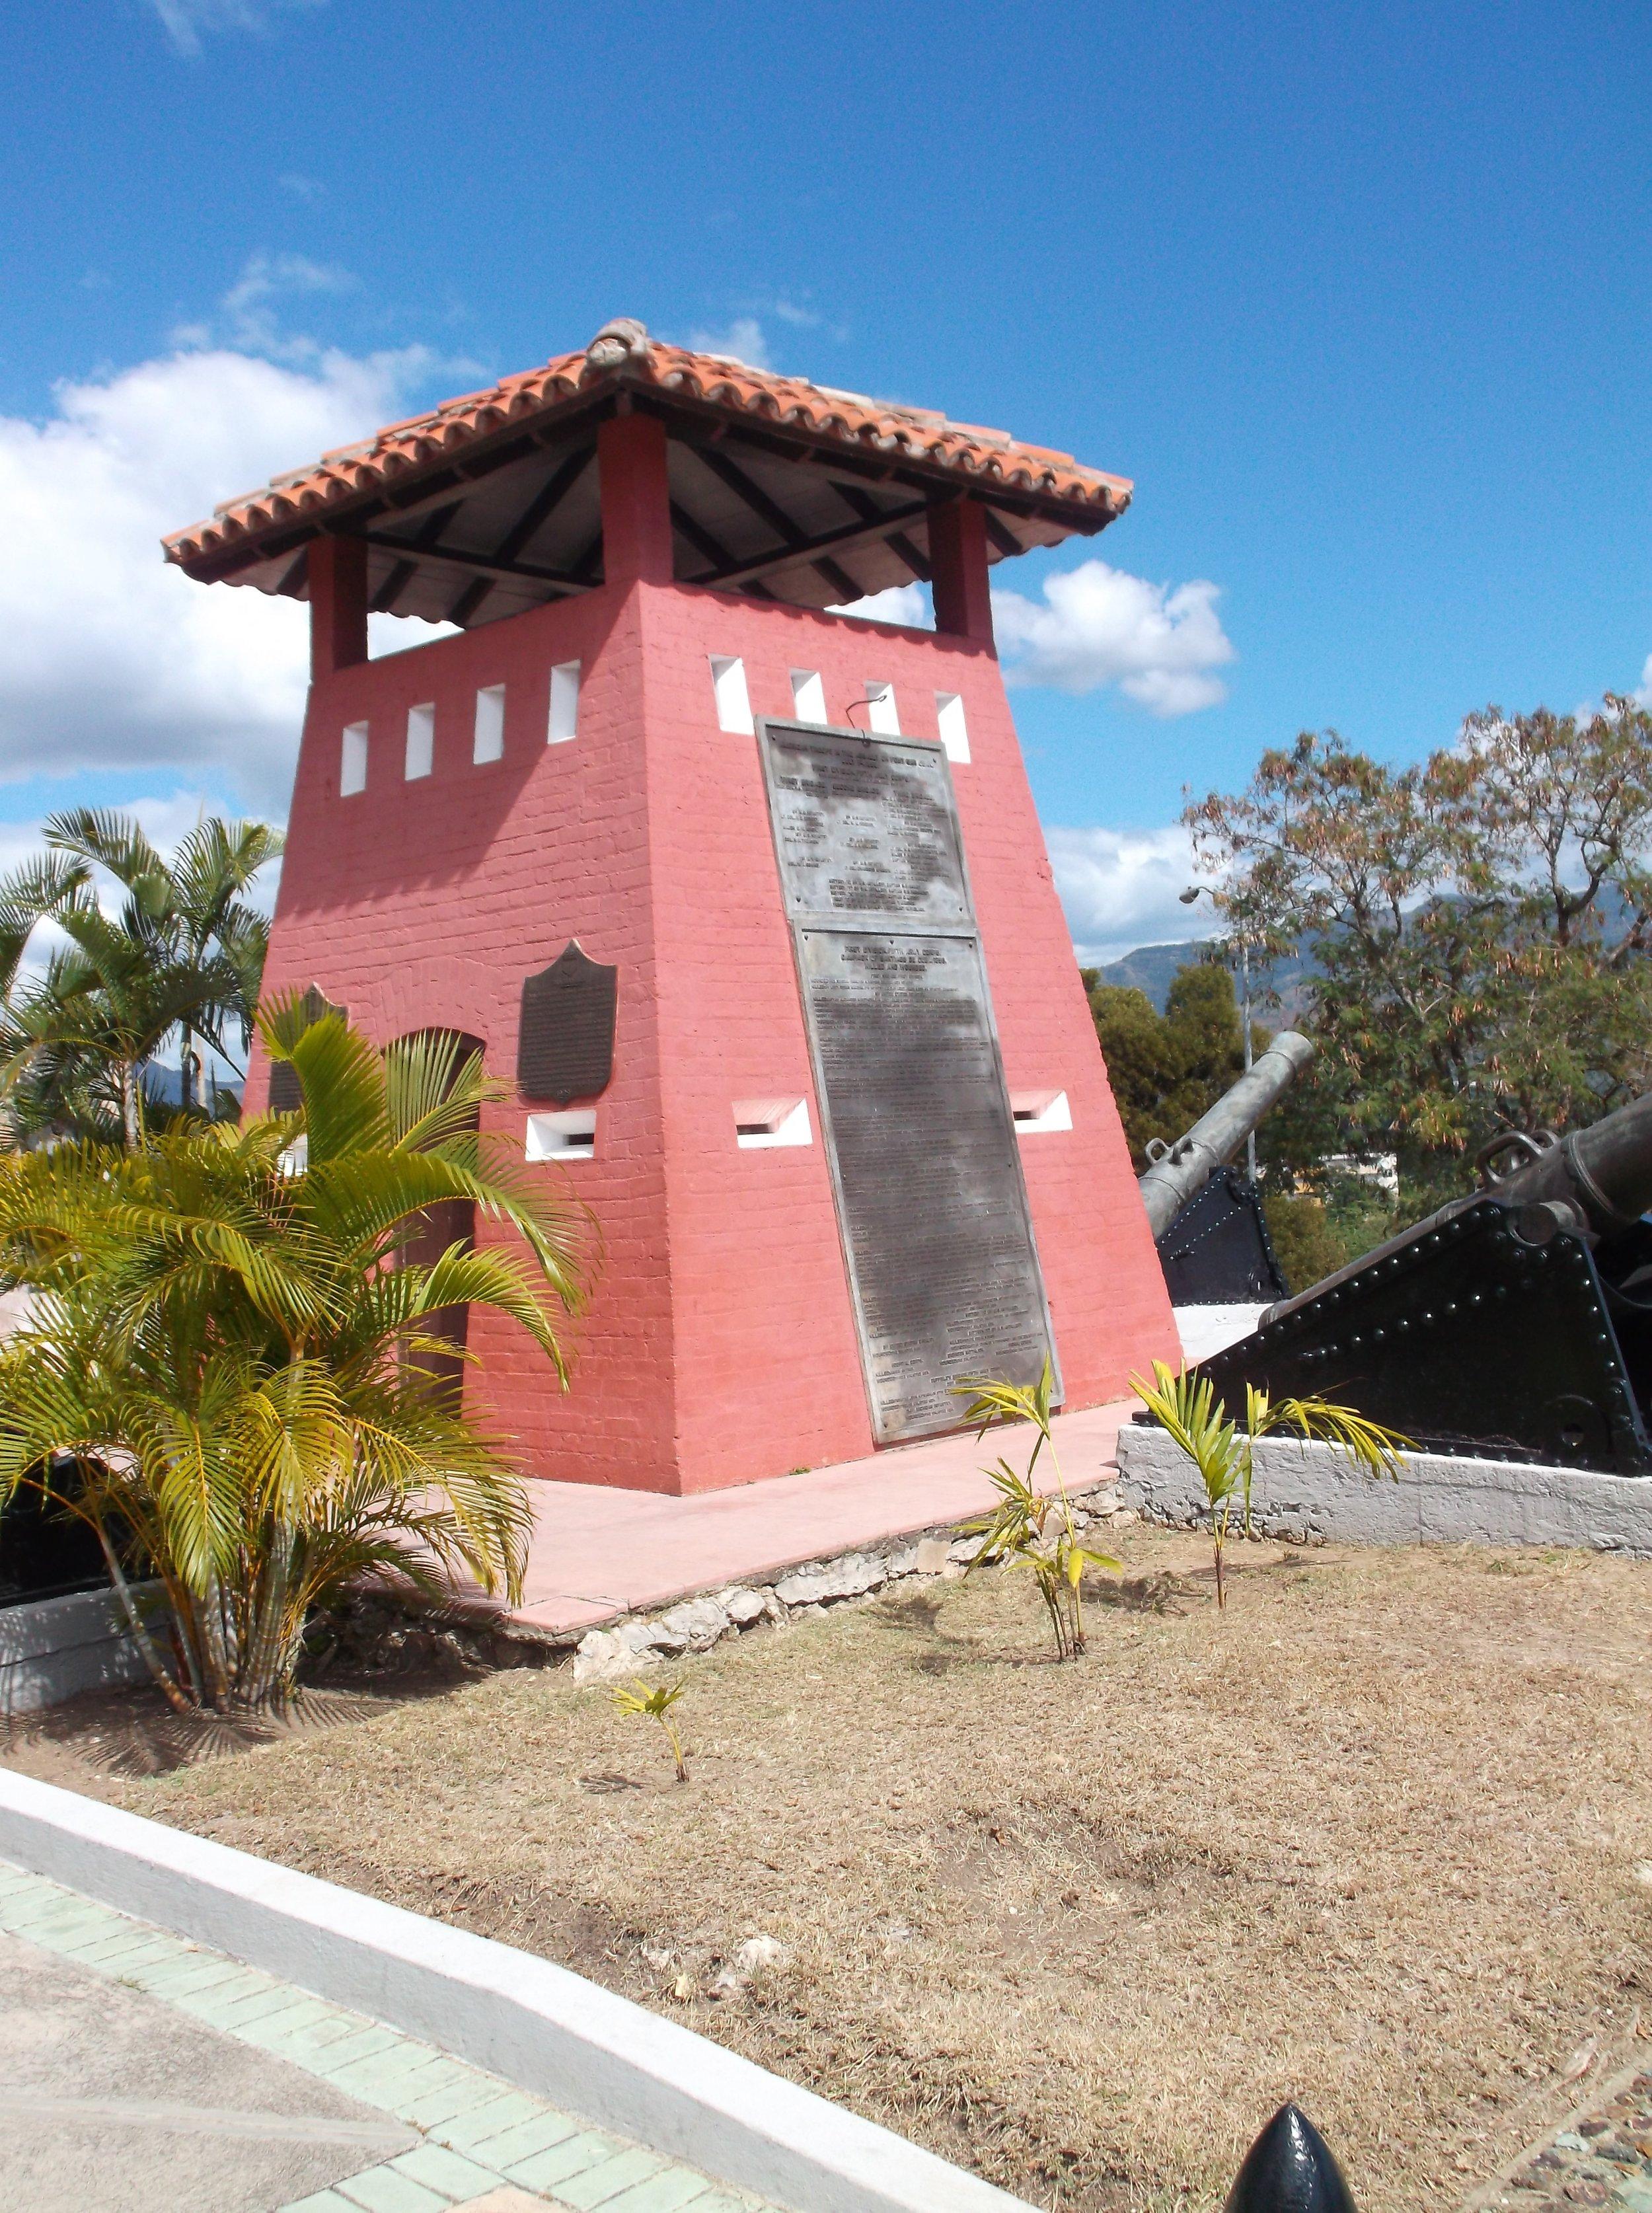 Cuba February 2019 (23) - San Juan Hill Monument Santiago de Cuba.JPG